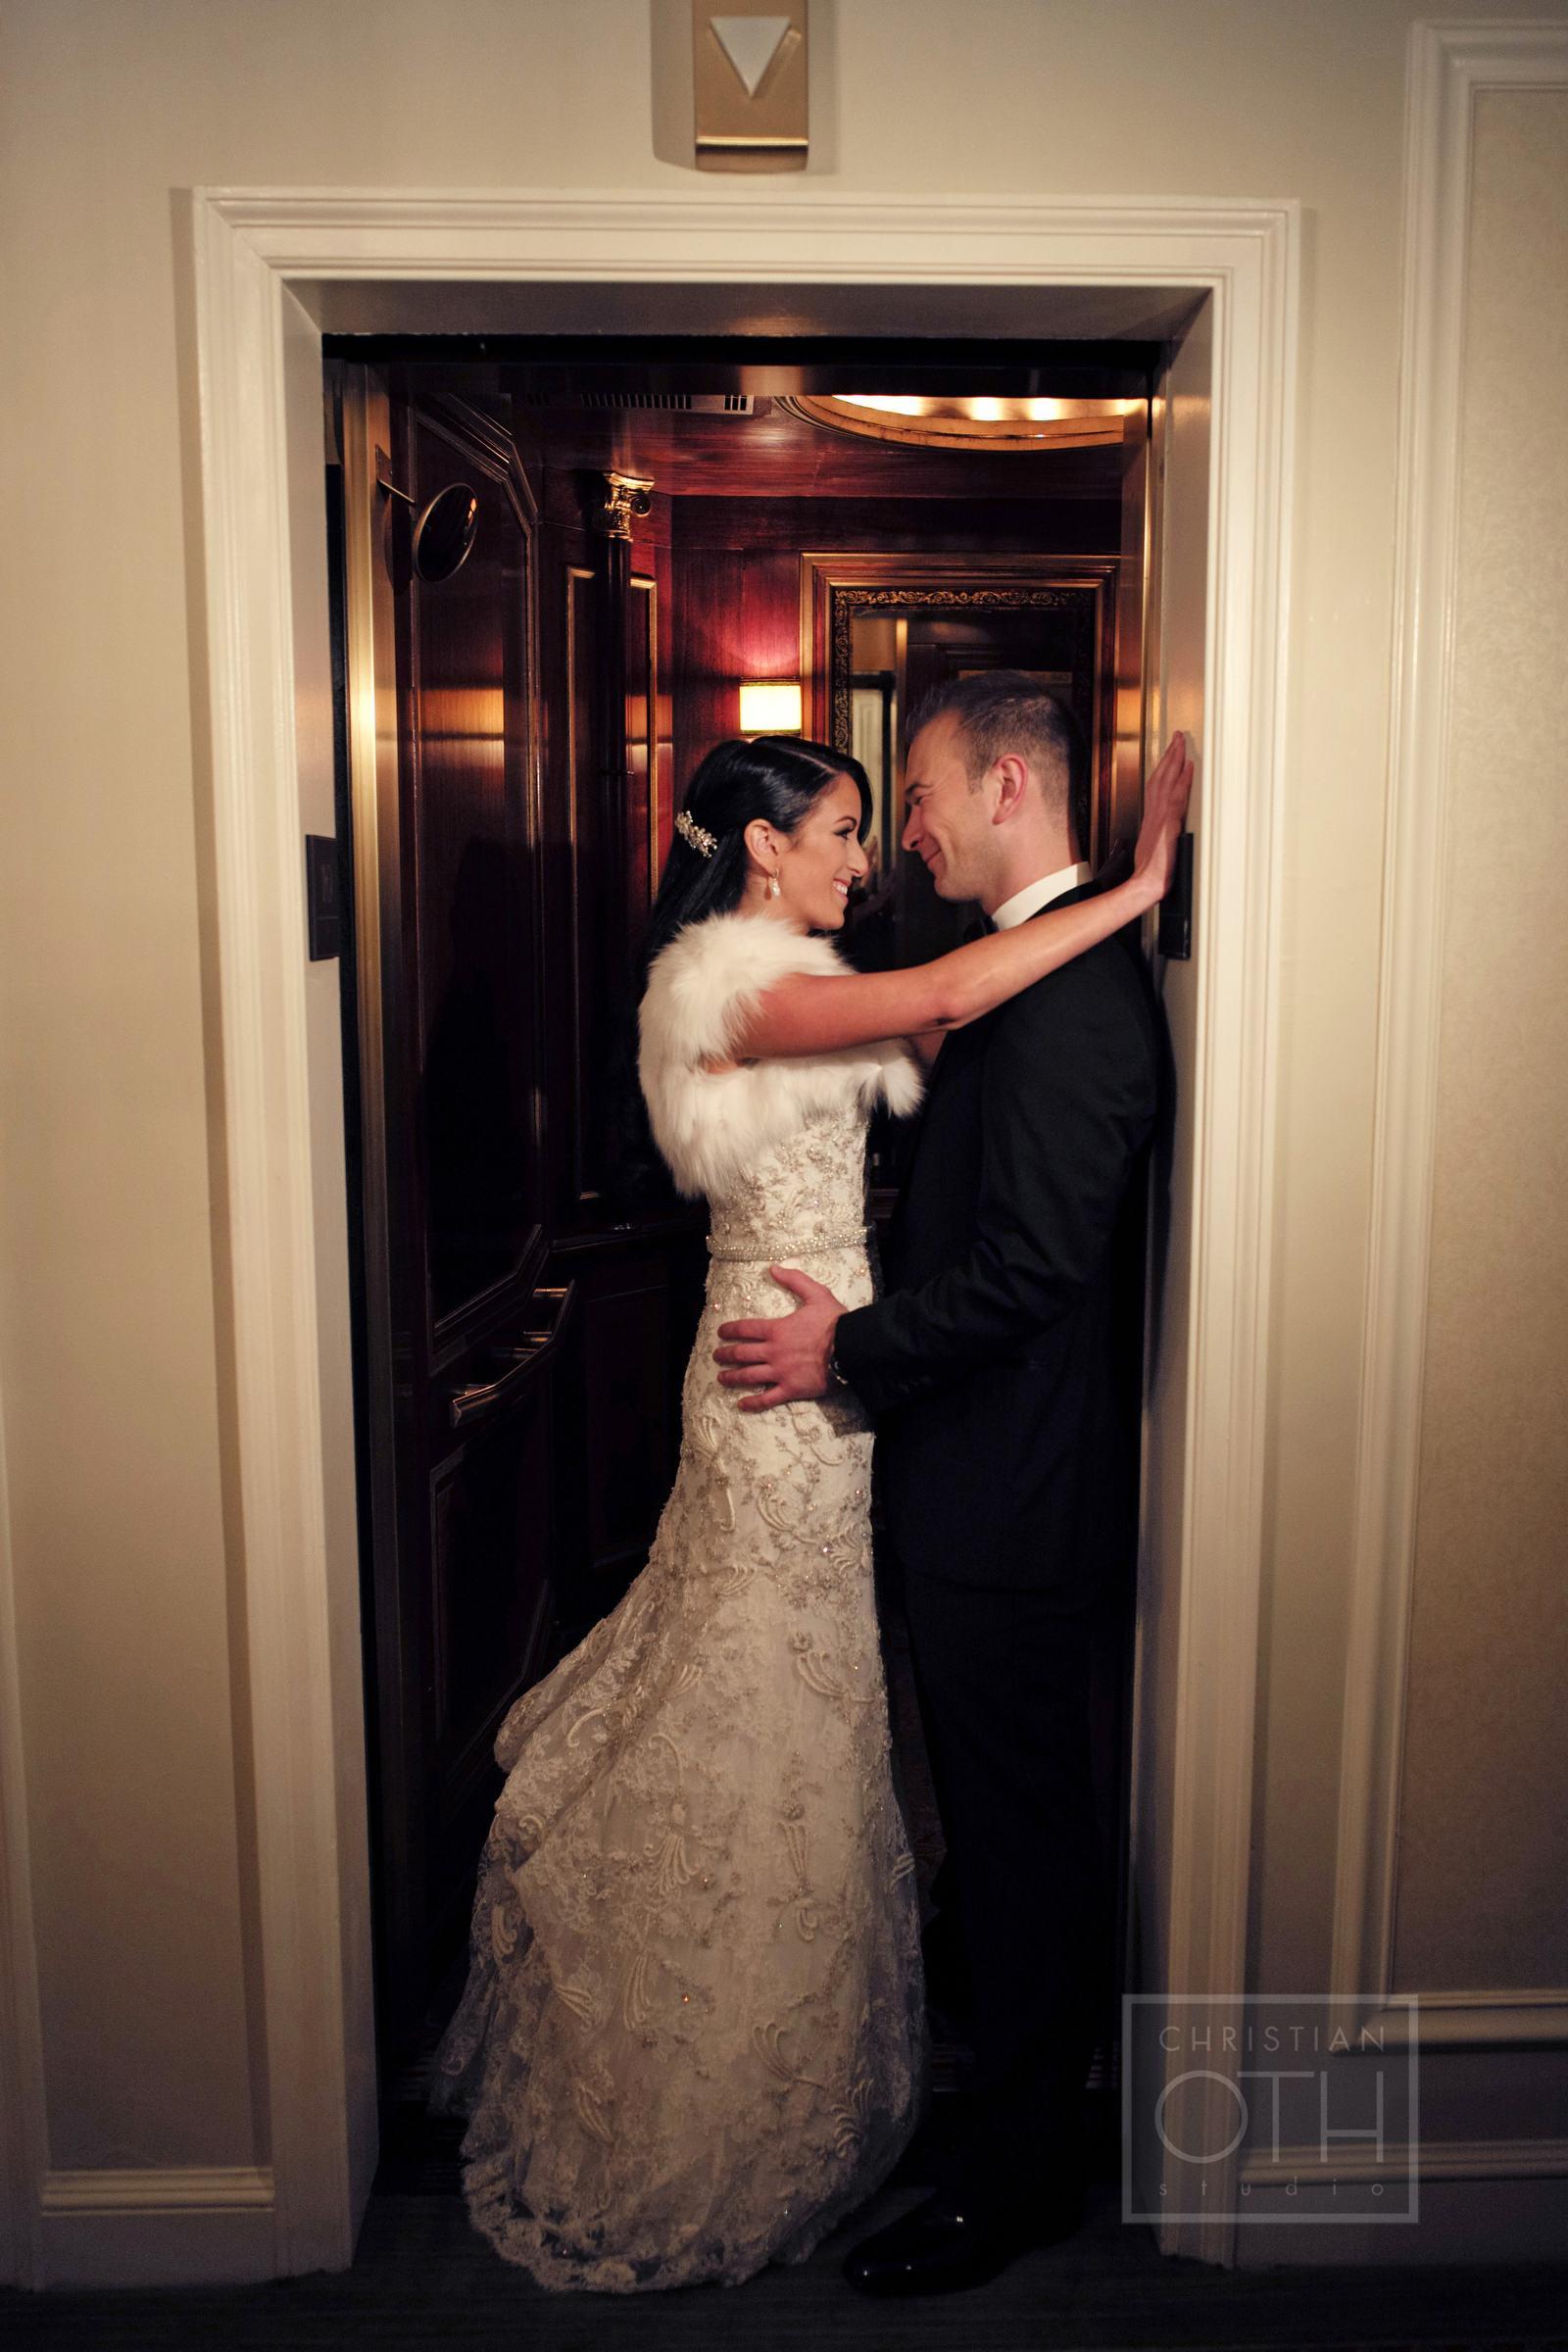 Ceci_New_York_Custom_Invitation_Pierre__City_ Destination_Wedding_Luxury_Personalized_Ceci_Style_Bride_Rose_Gold_Foil_Stamping48.JPG